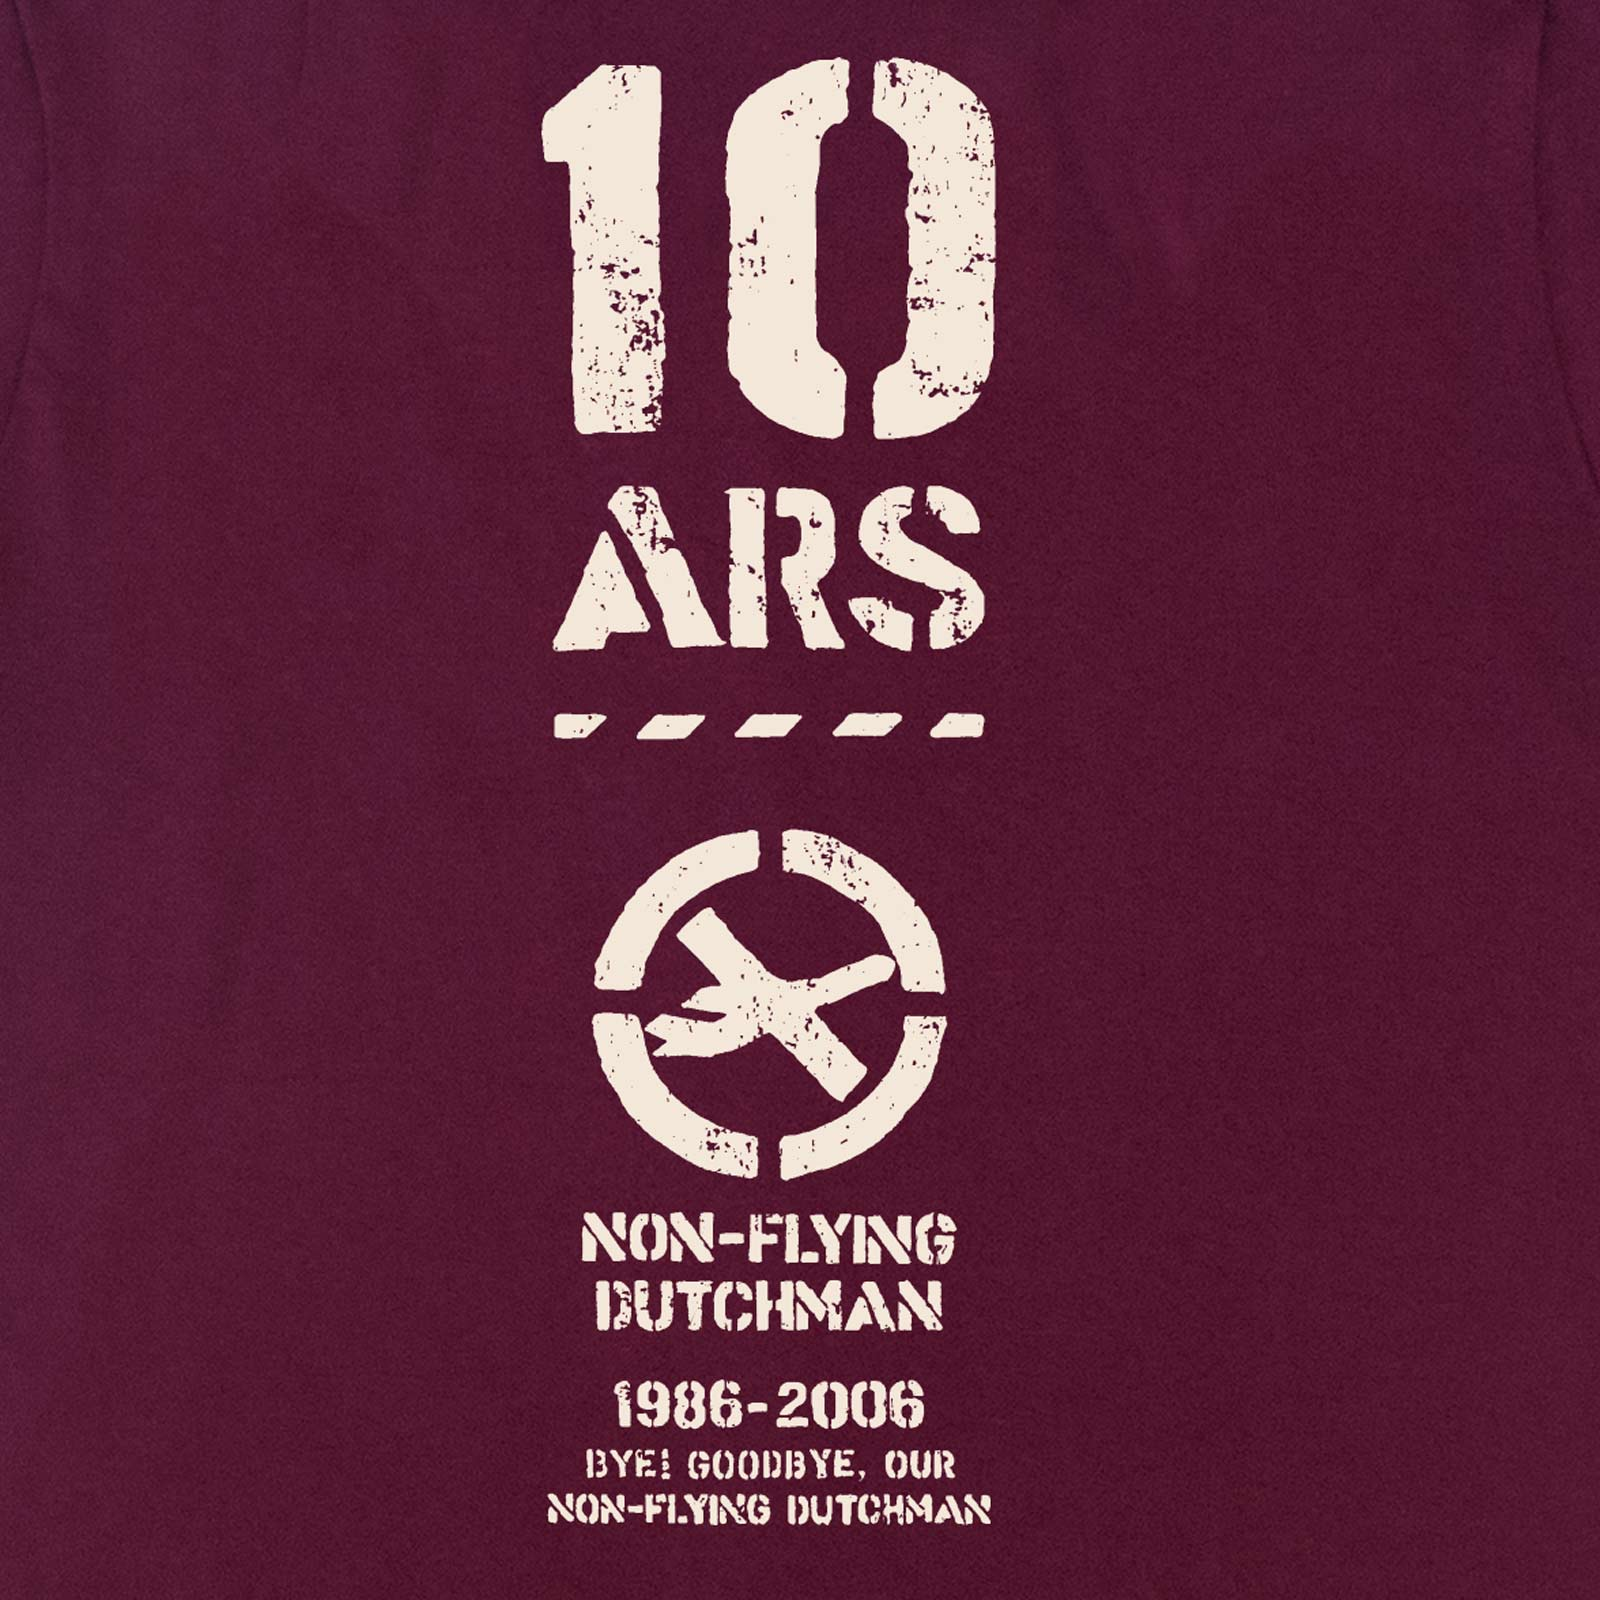 Goodbye Non-Flying Dutchman ベルカンプ引退記念Tシャツ 復刻モデル